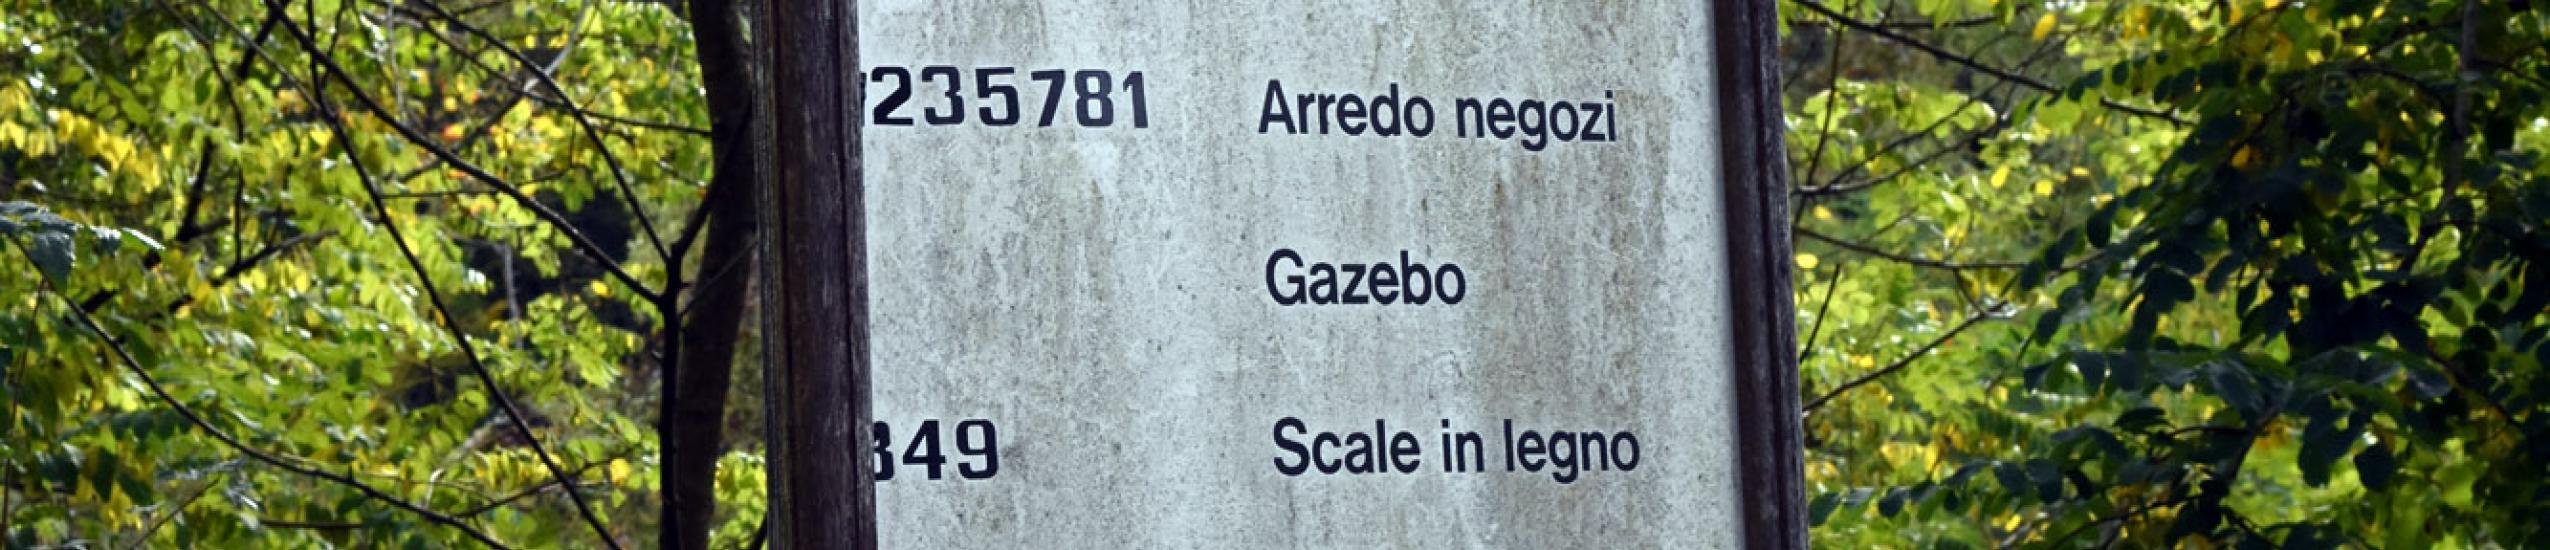 Falegnameria Legno Arreda